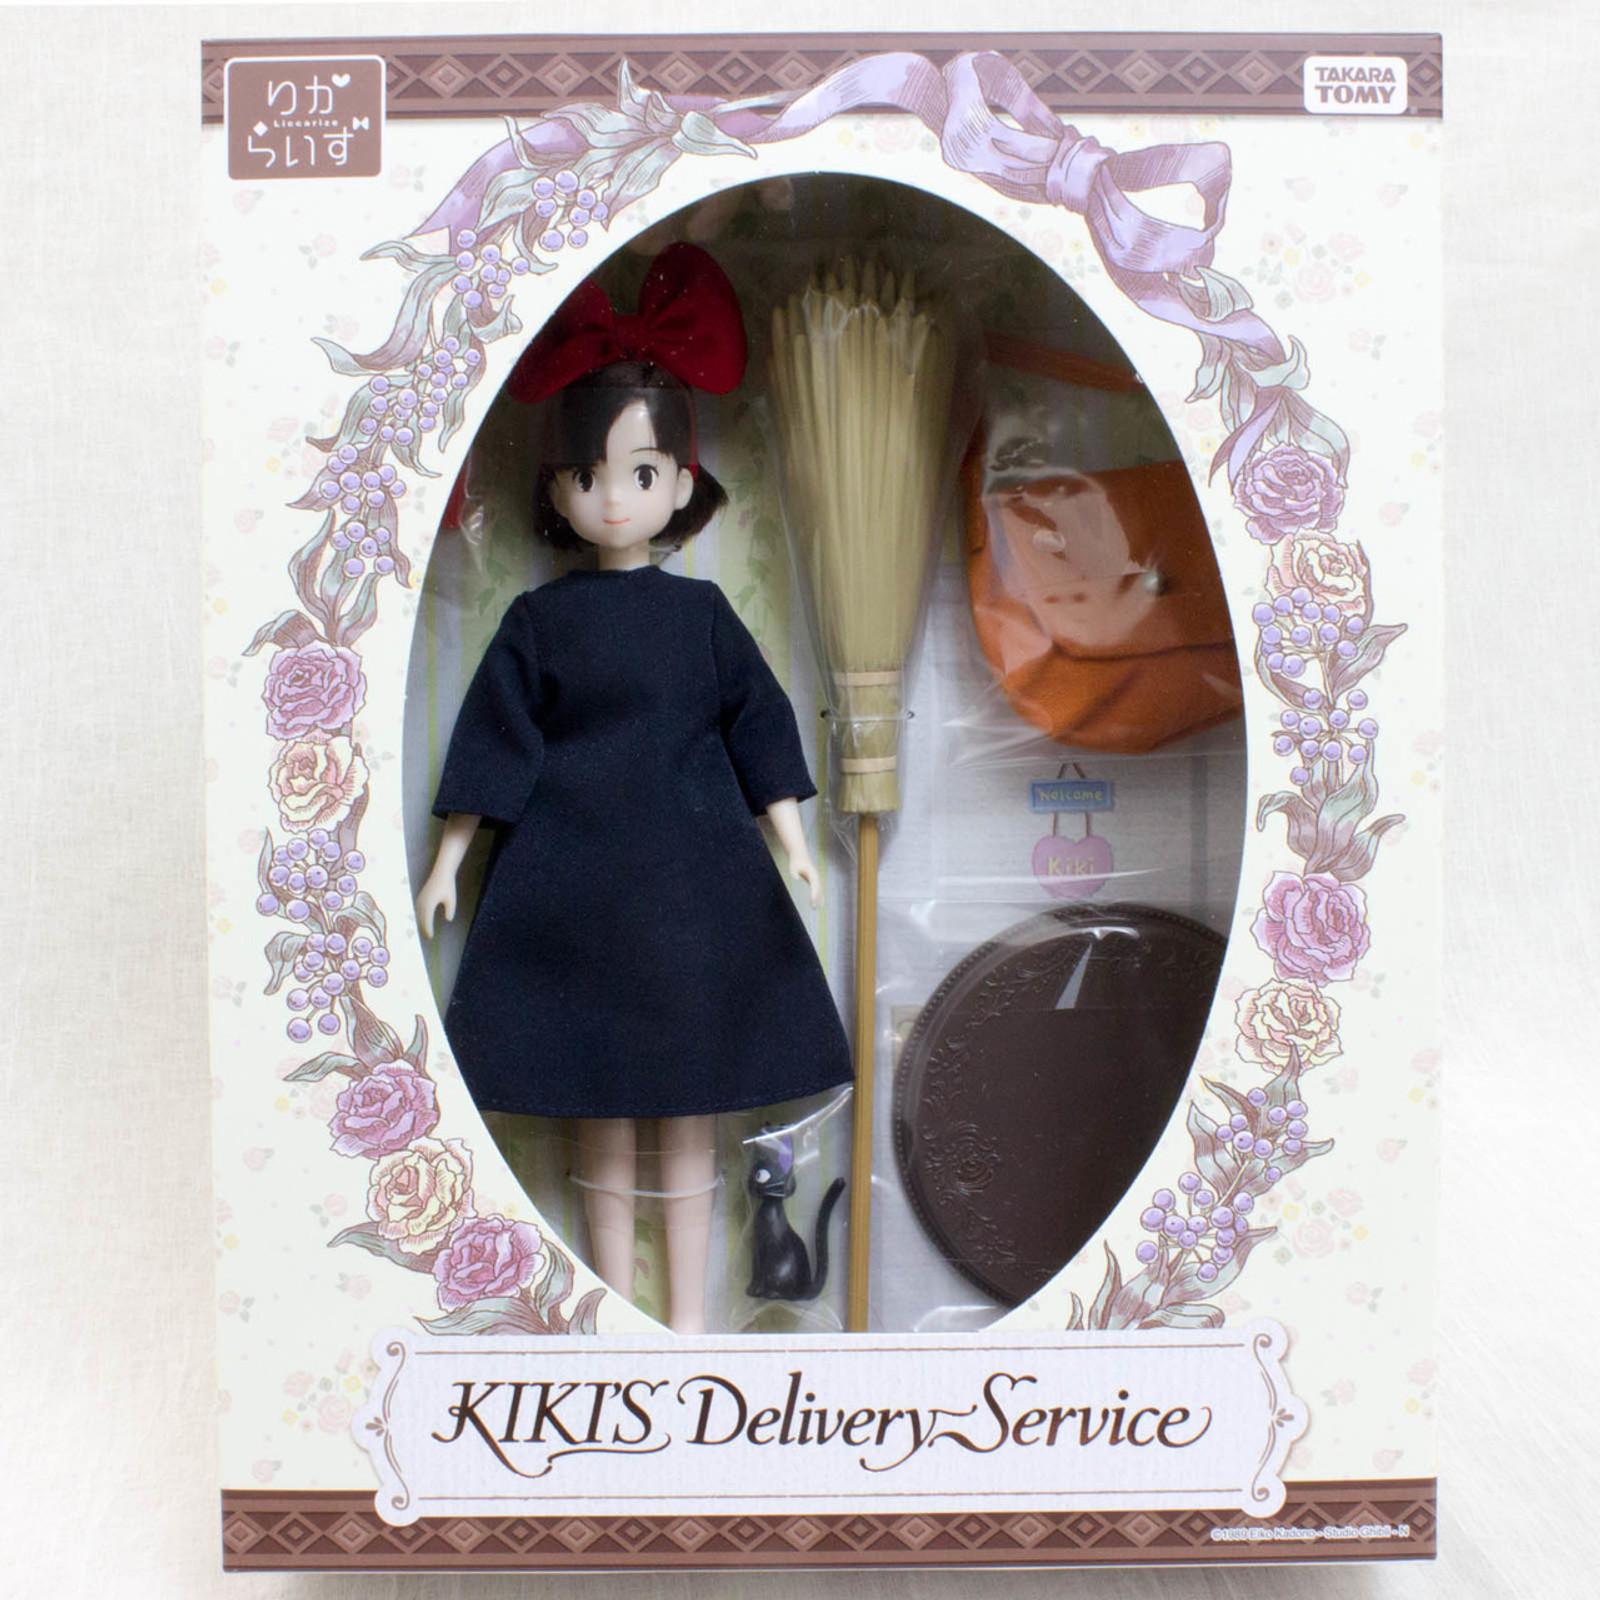 Kiki's Delivery Service Figure Licca Rize Doll Takara Tomy Ghibli JAPAN ANIME